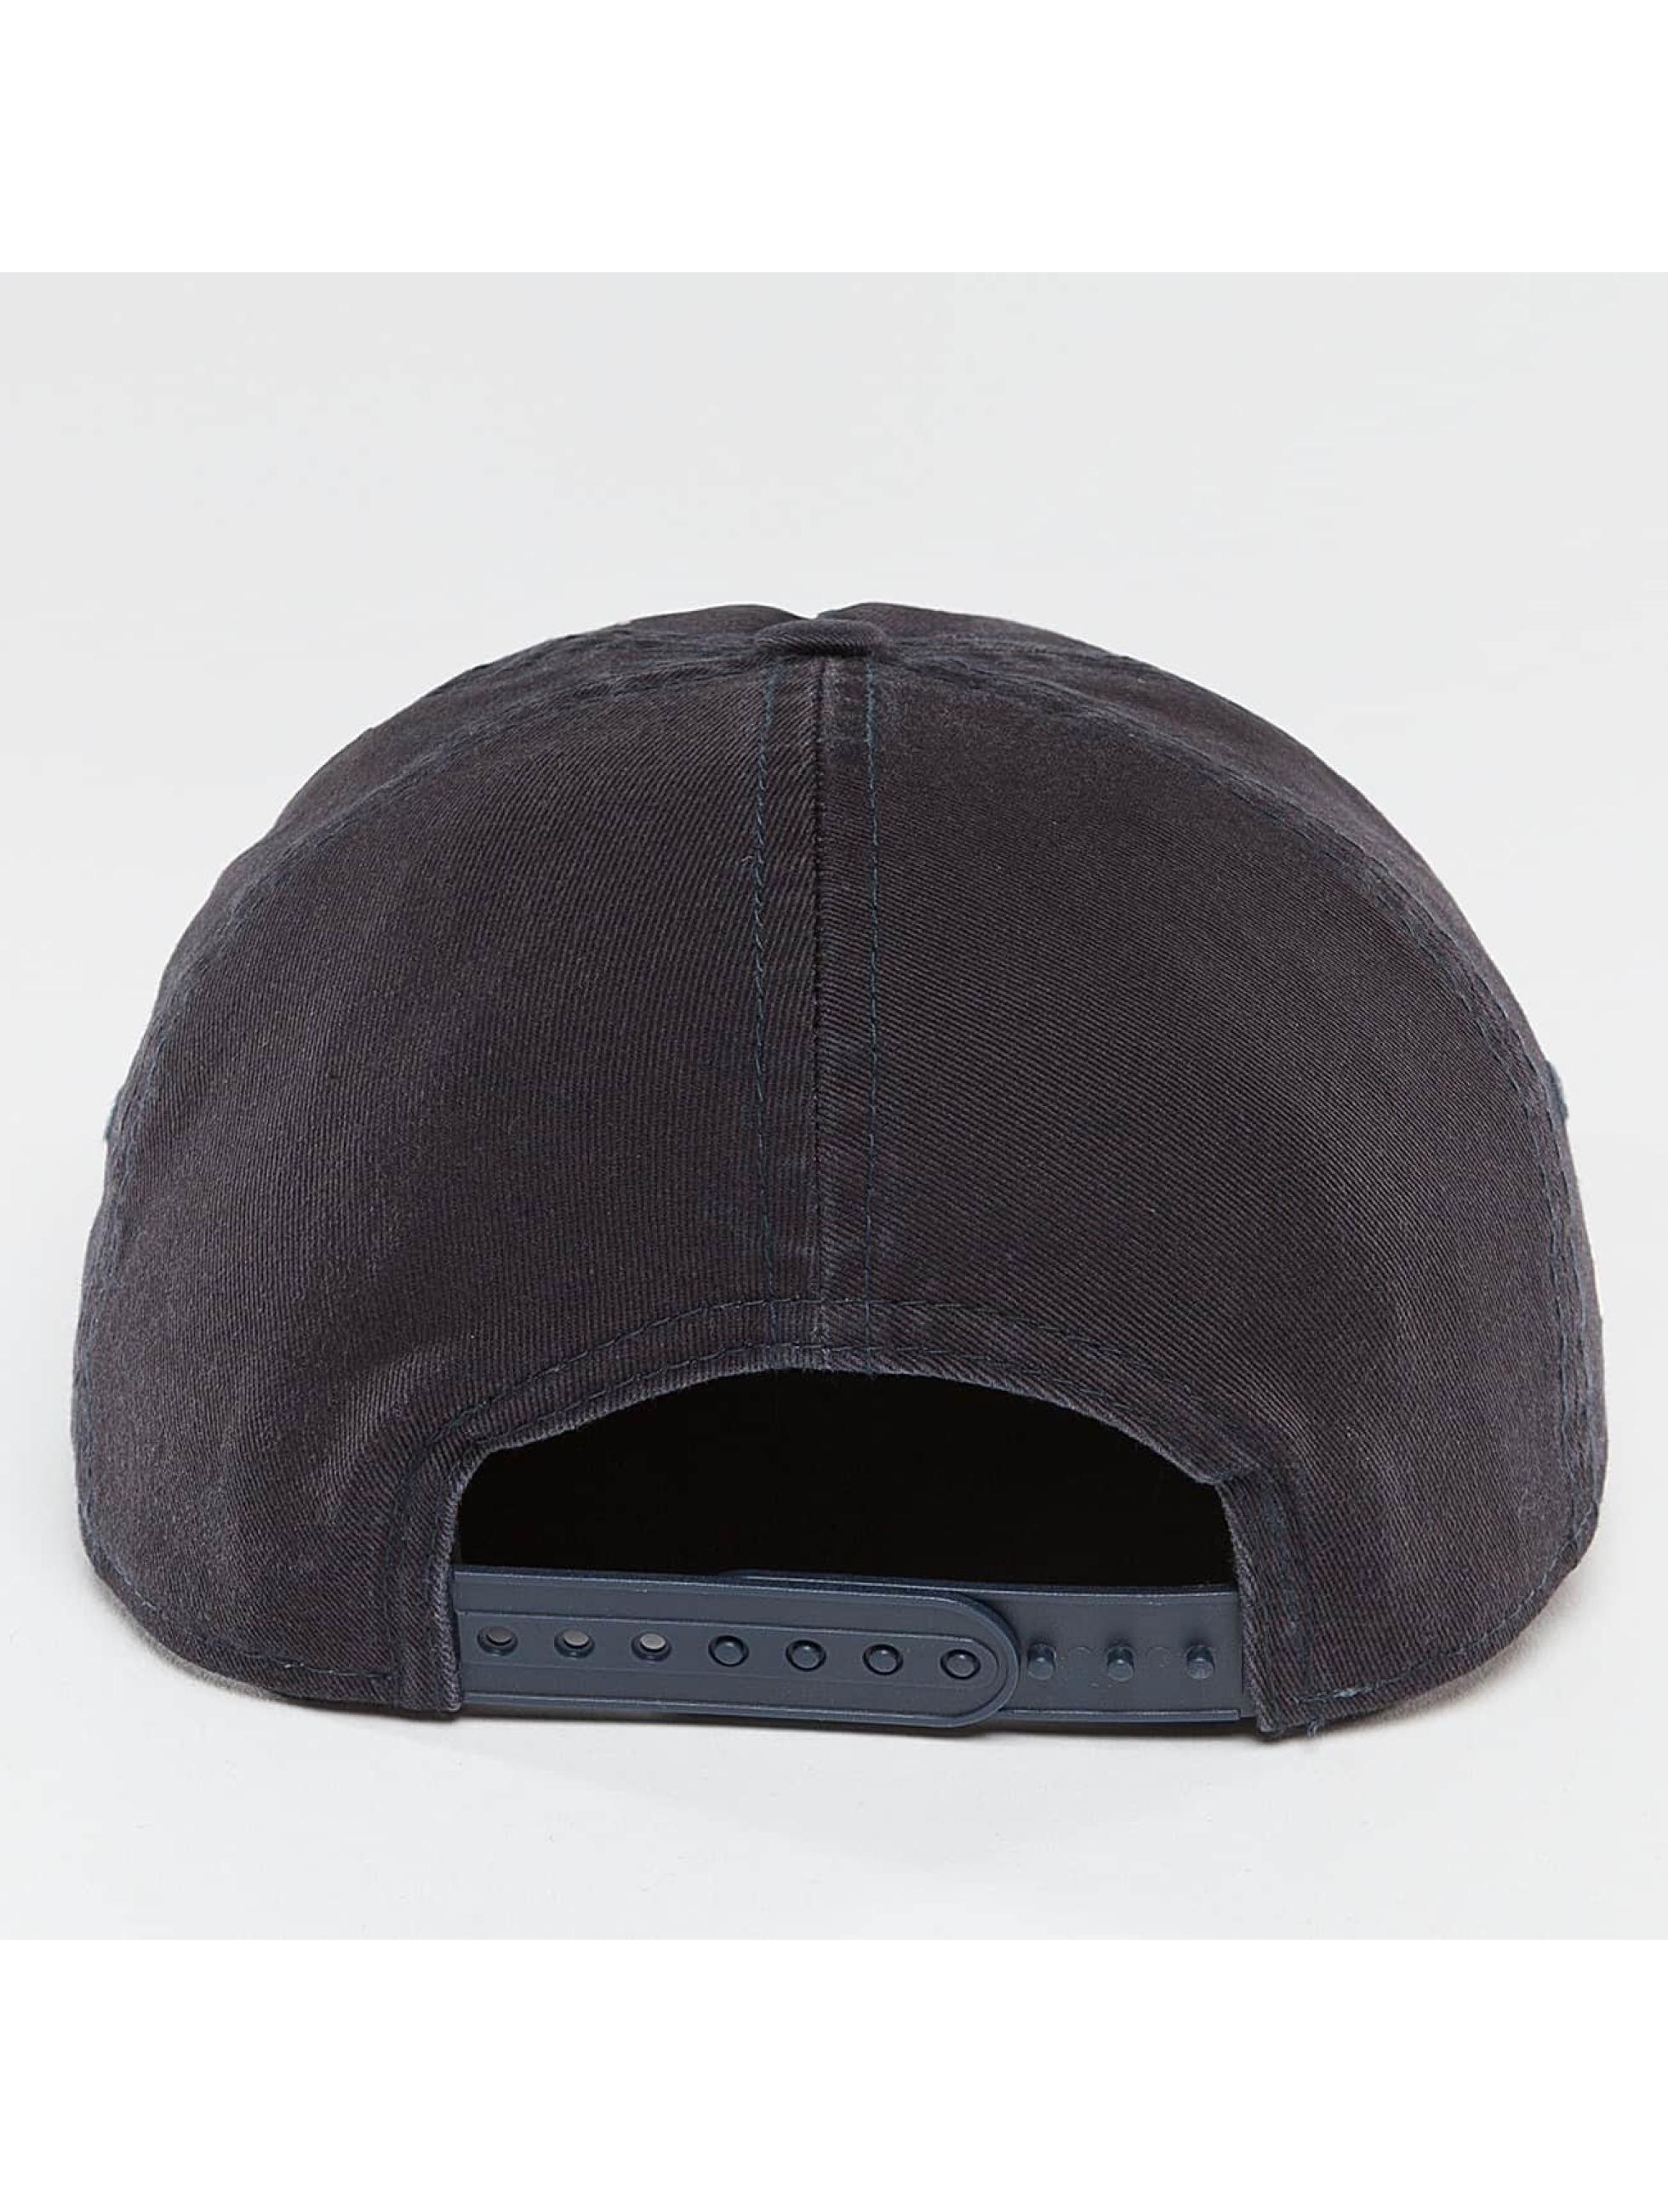 New Era Snapback Cap Chain Stitch NY Yankees blue